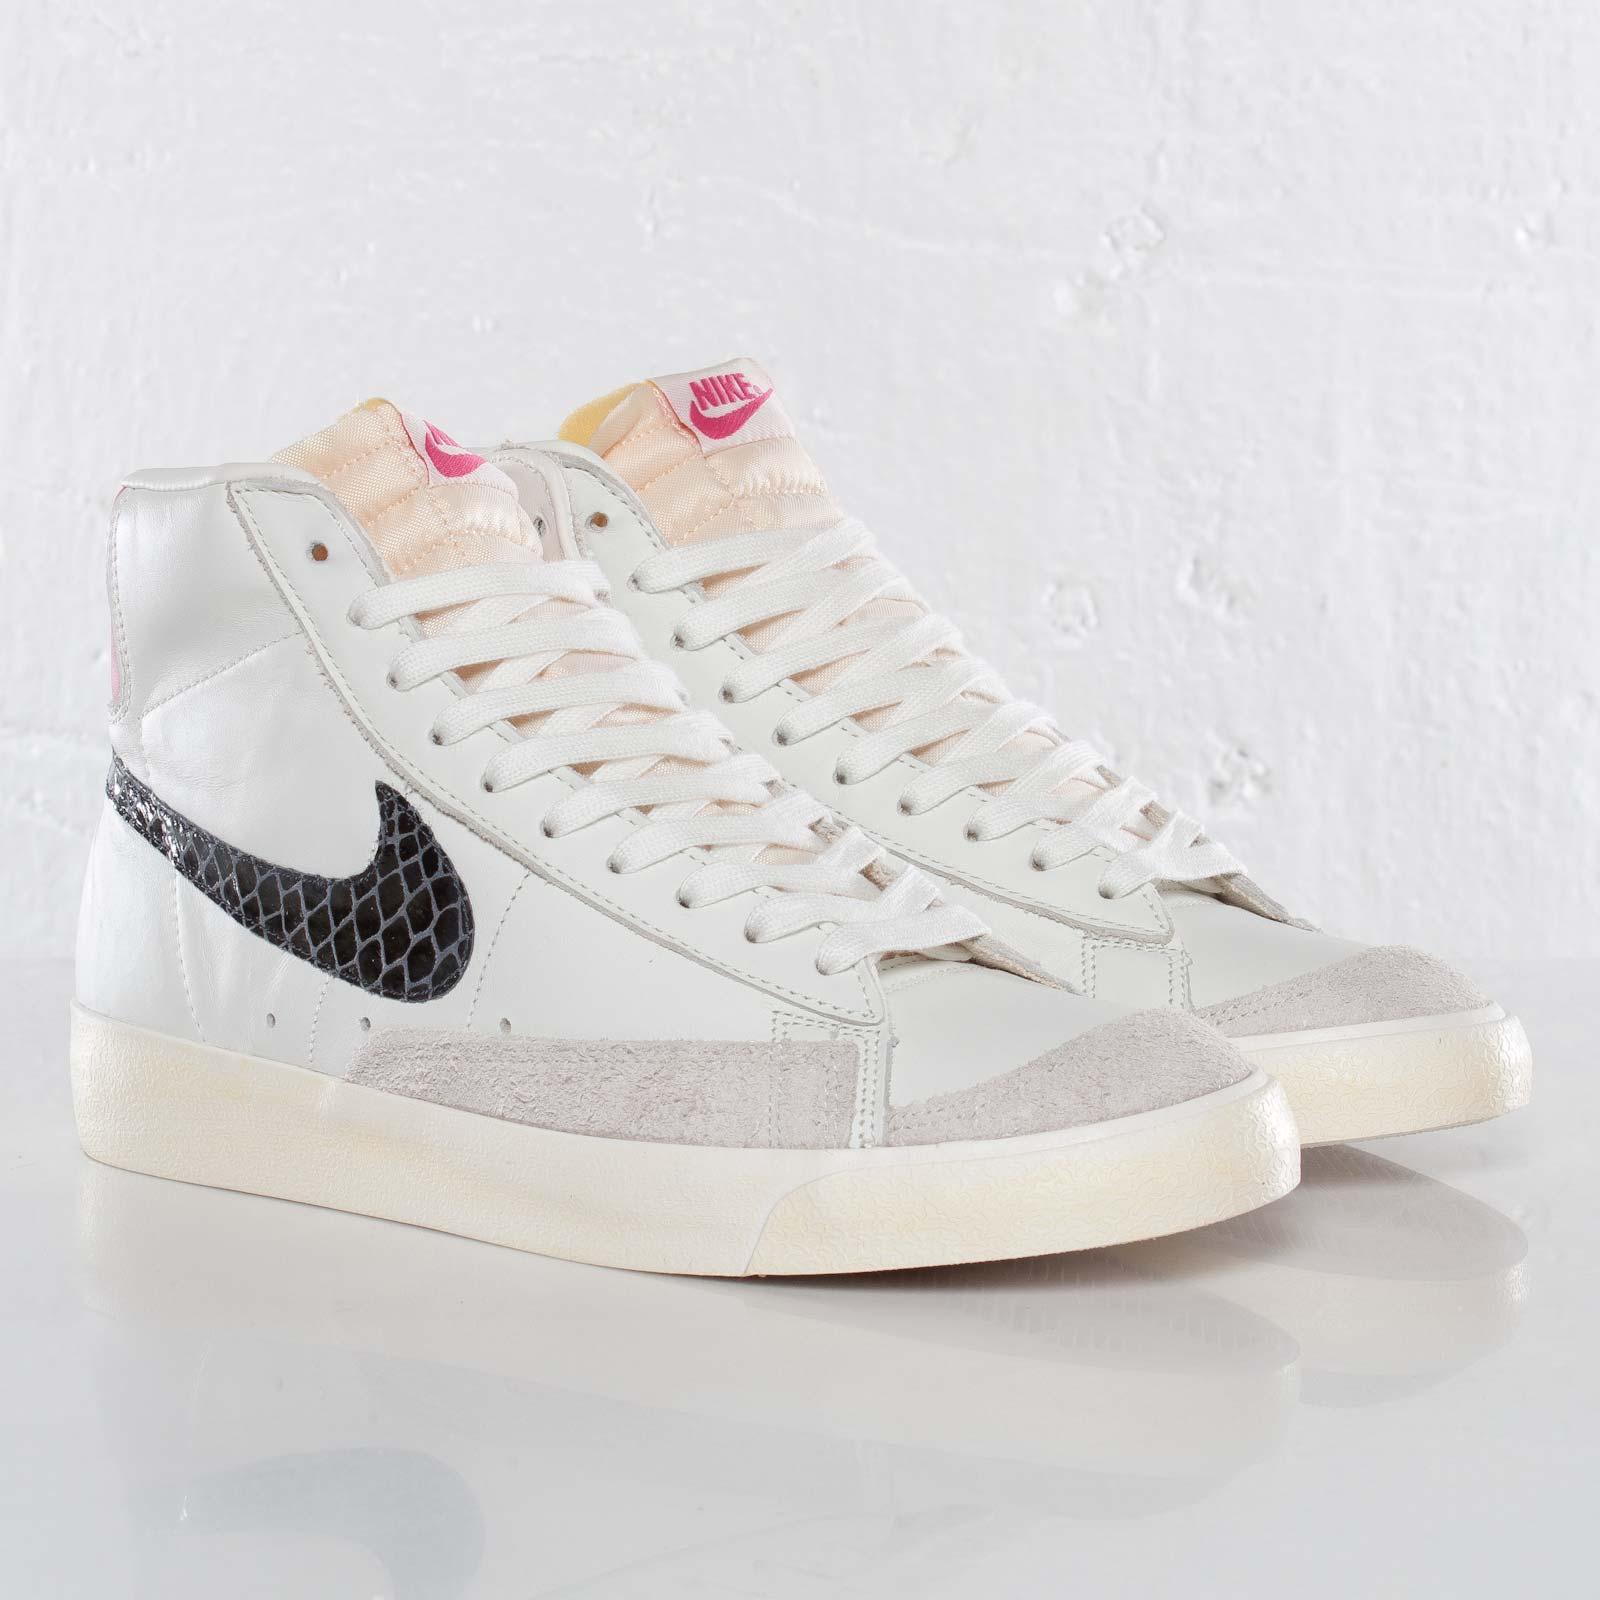 Nike Blazer Mid ´77 Premium Vintage